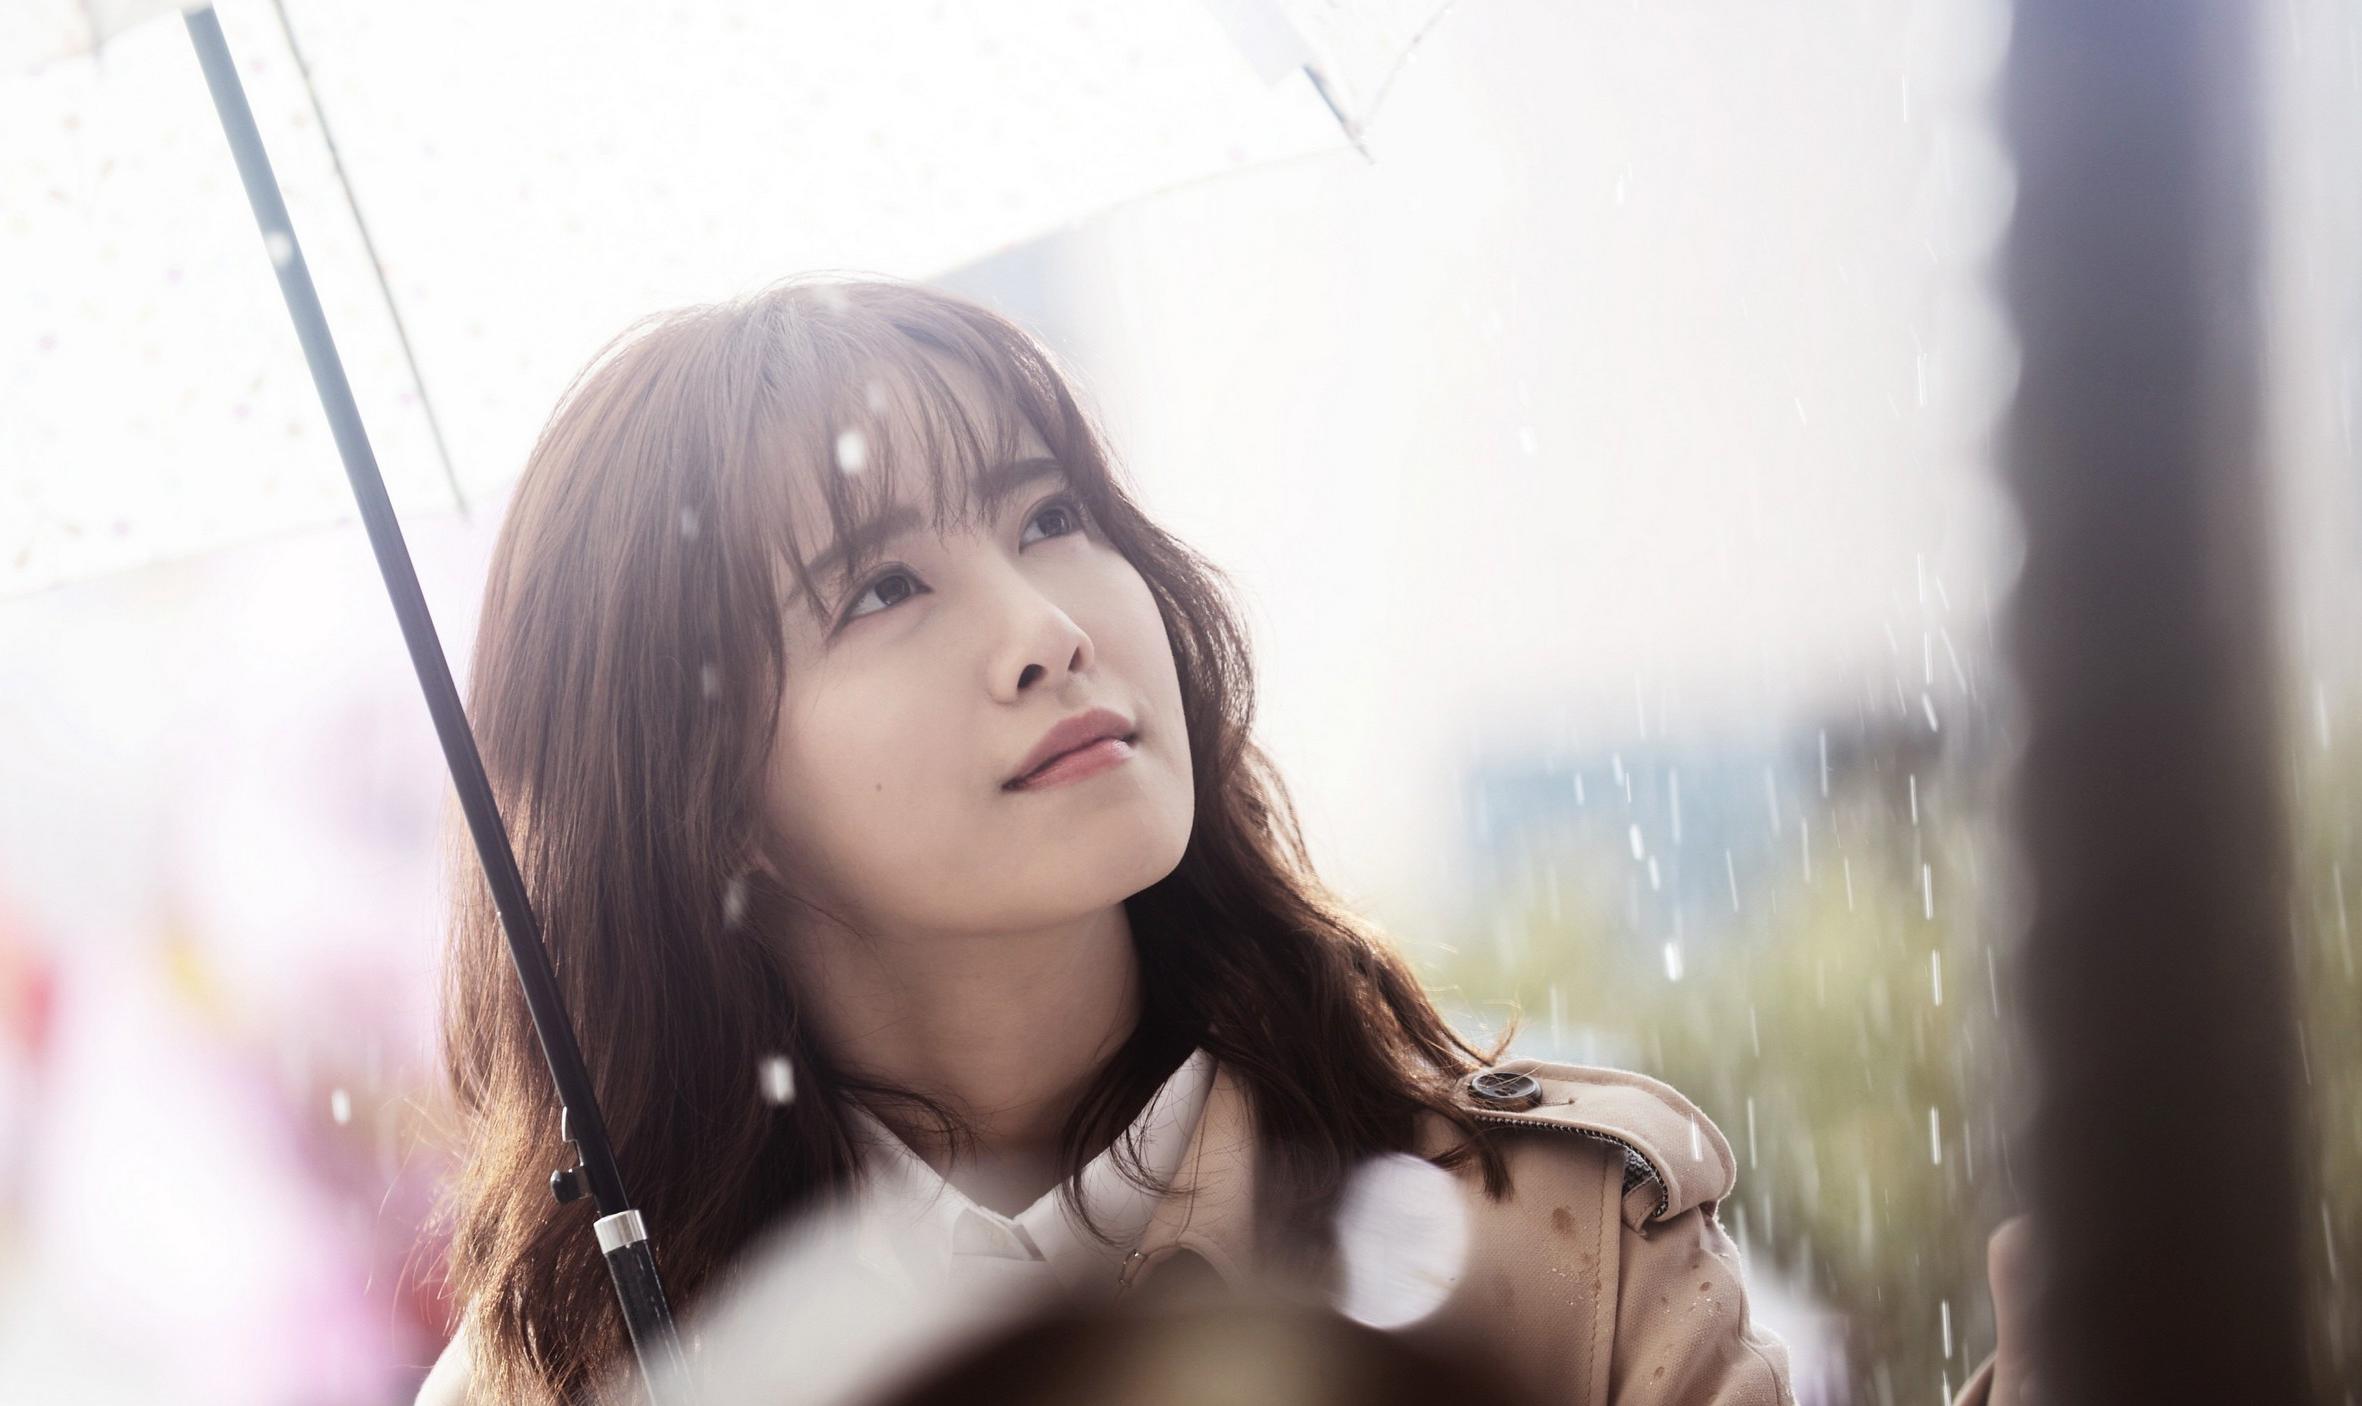 Gu hye sun pictures